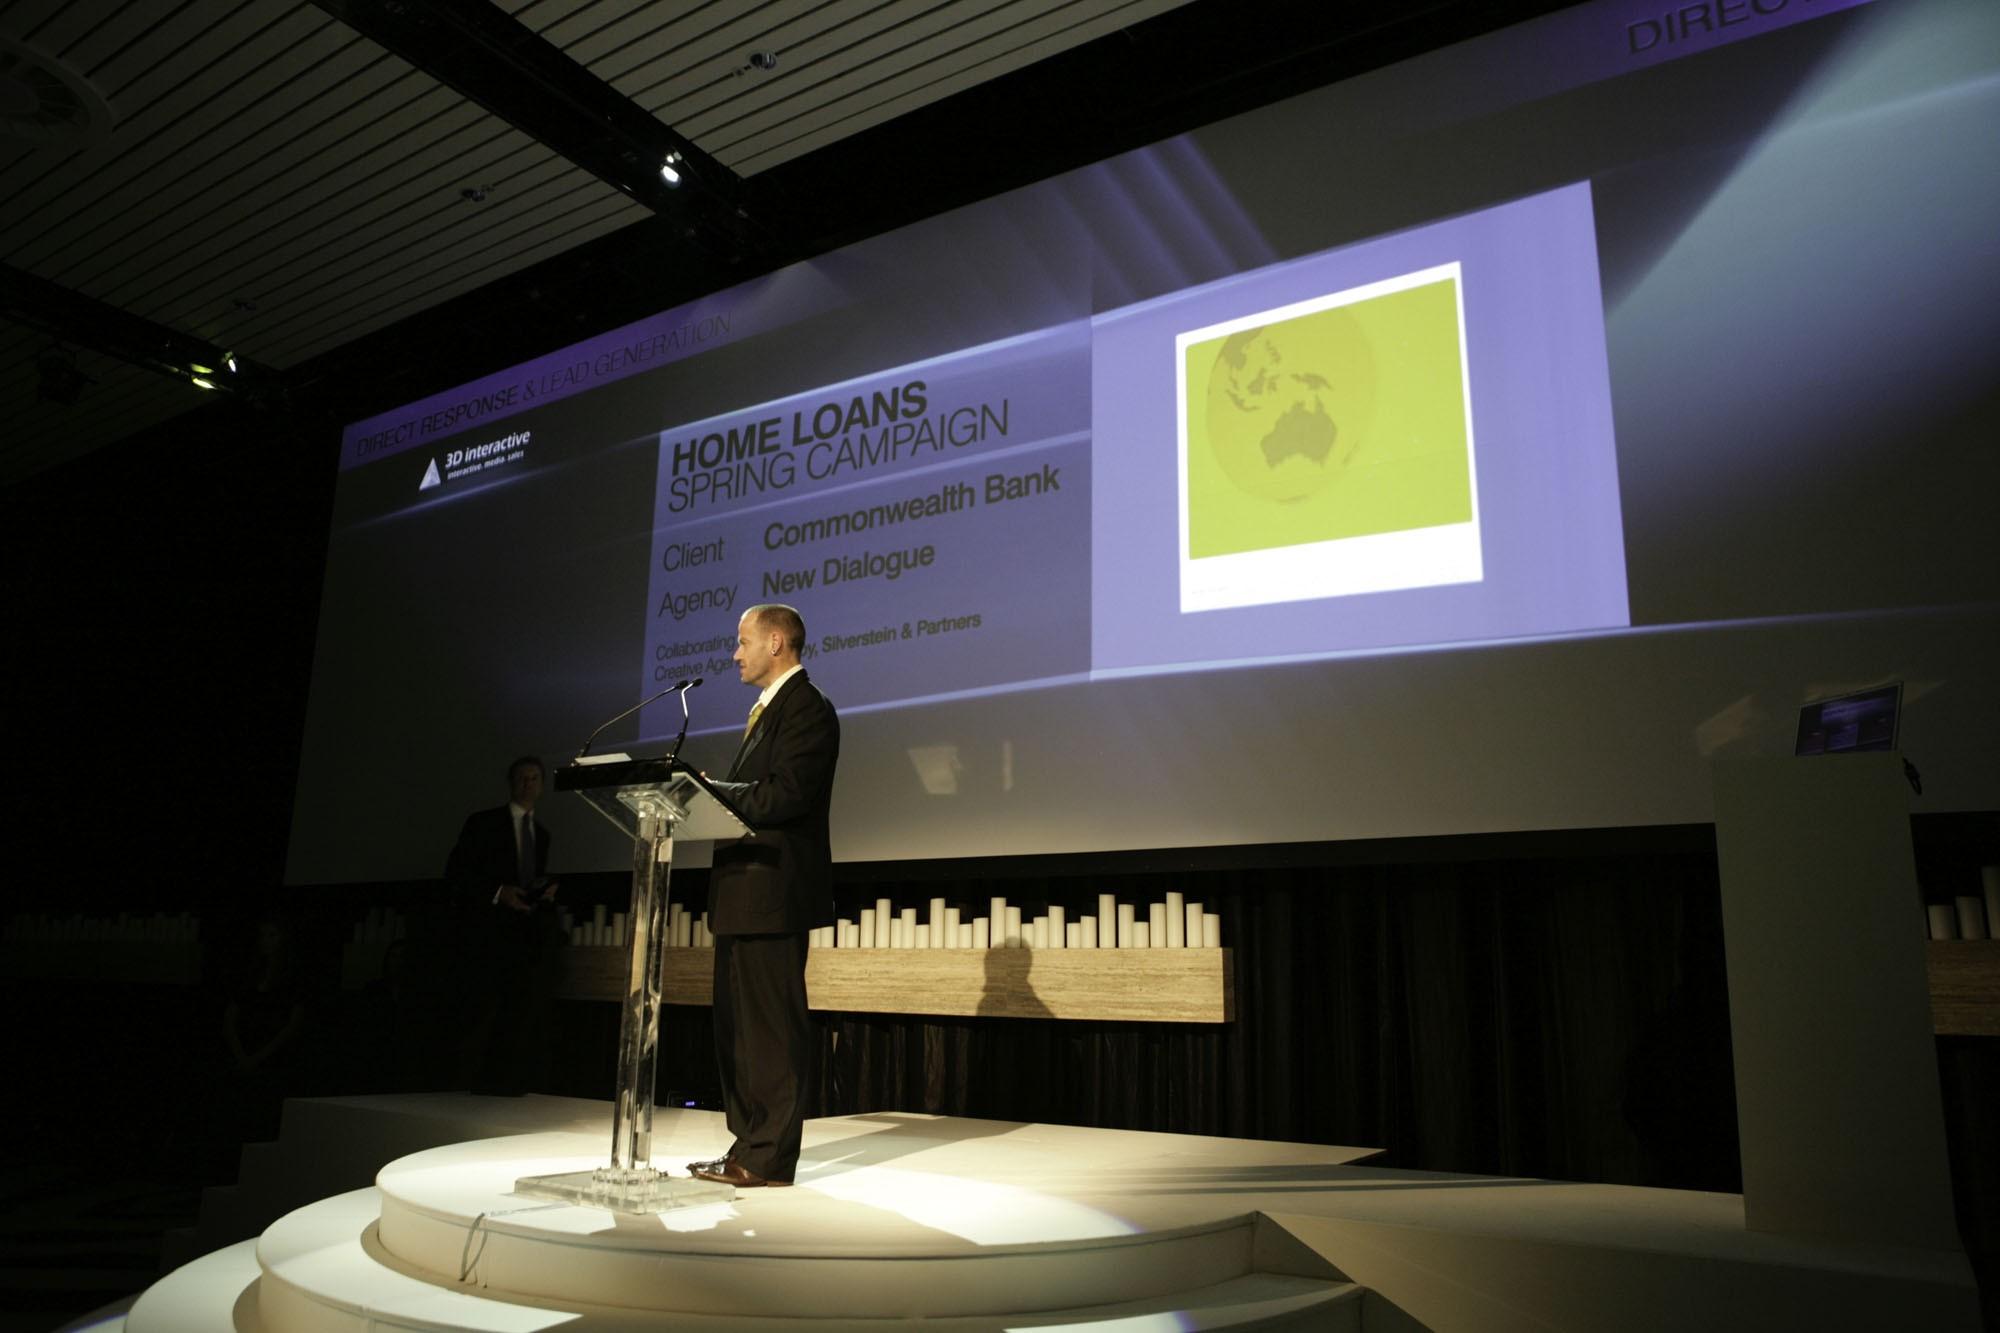 2009 IAB Award Direct Response and Lead Generation Finalist